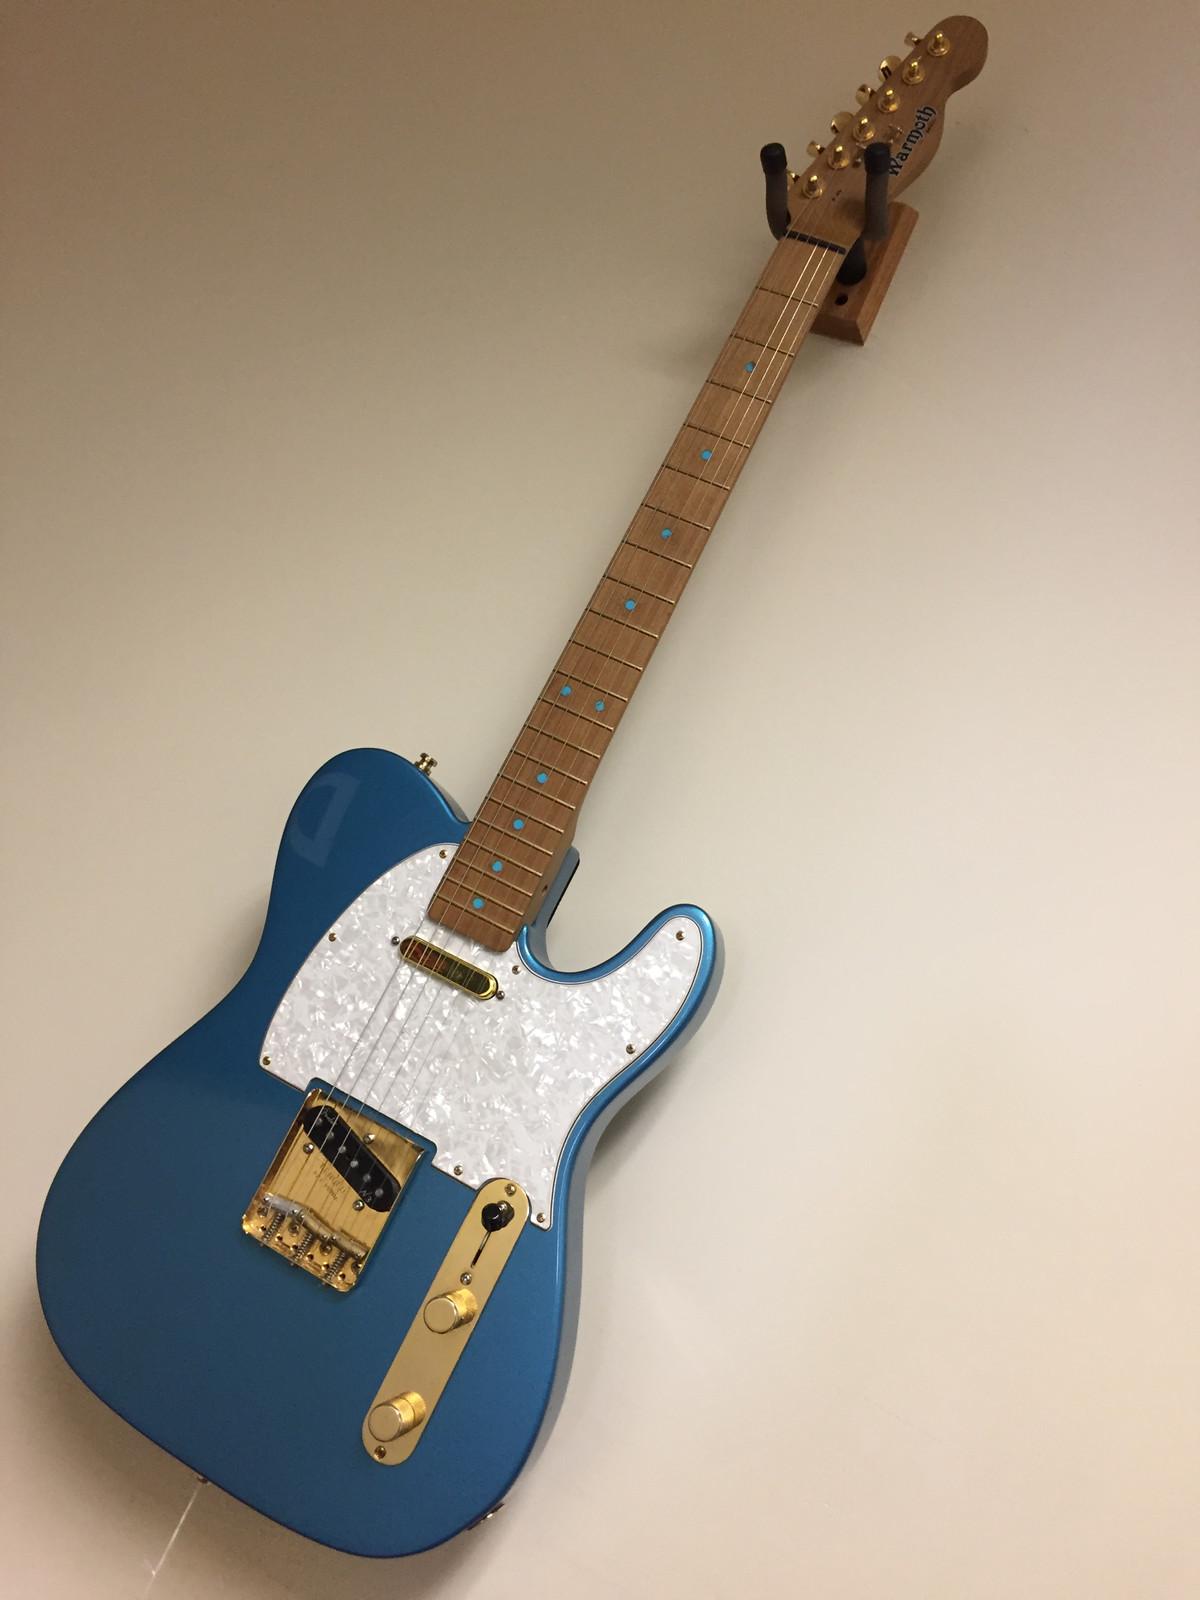 Warmoth/Fender Telecaster